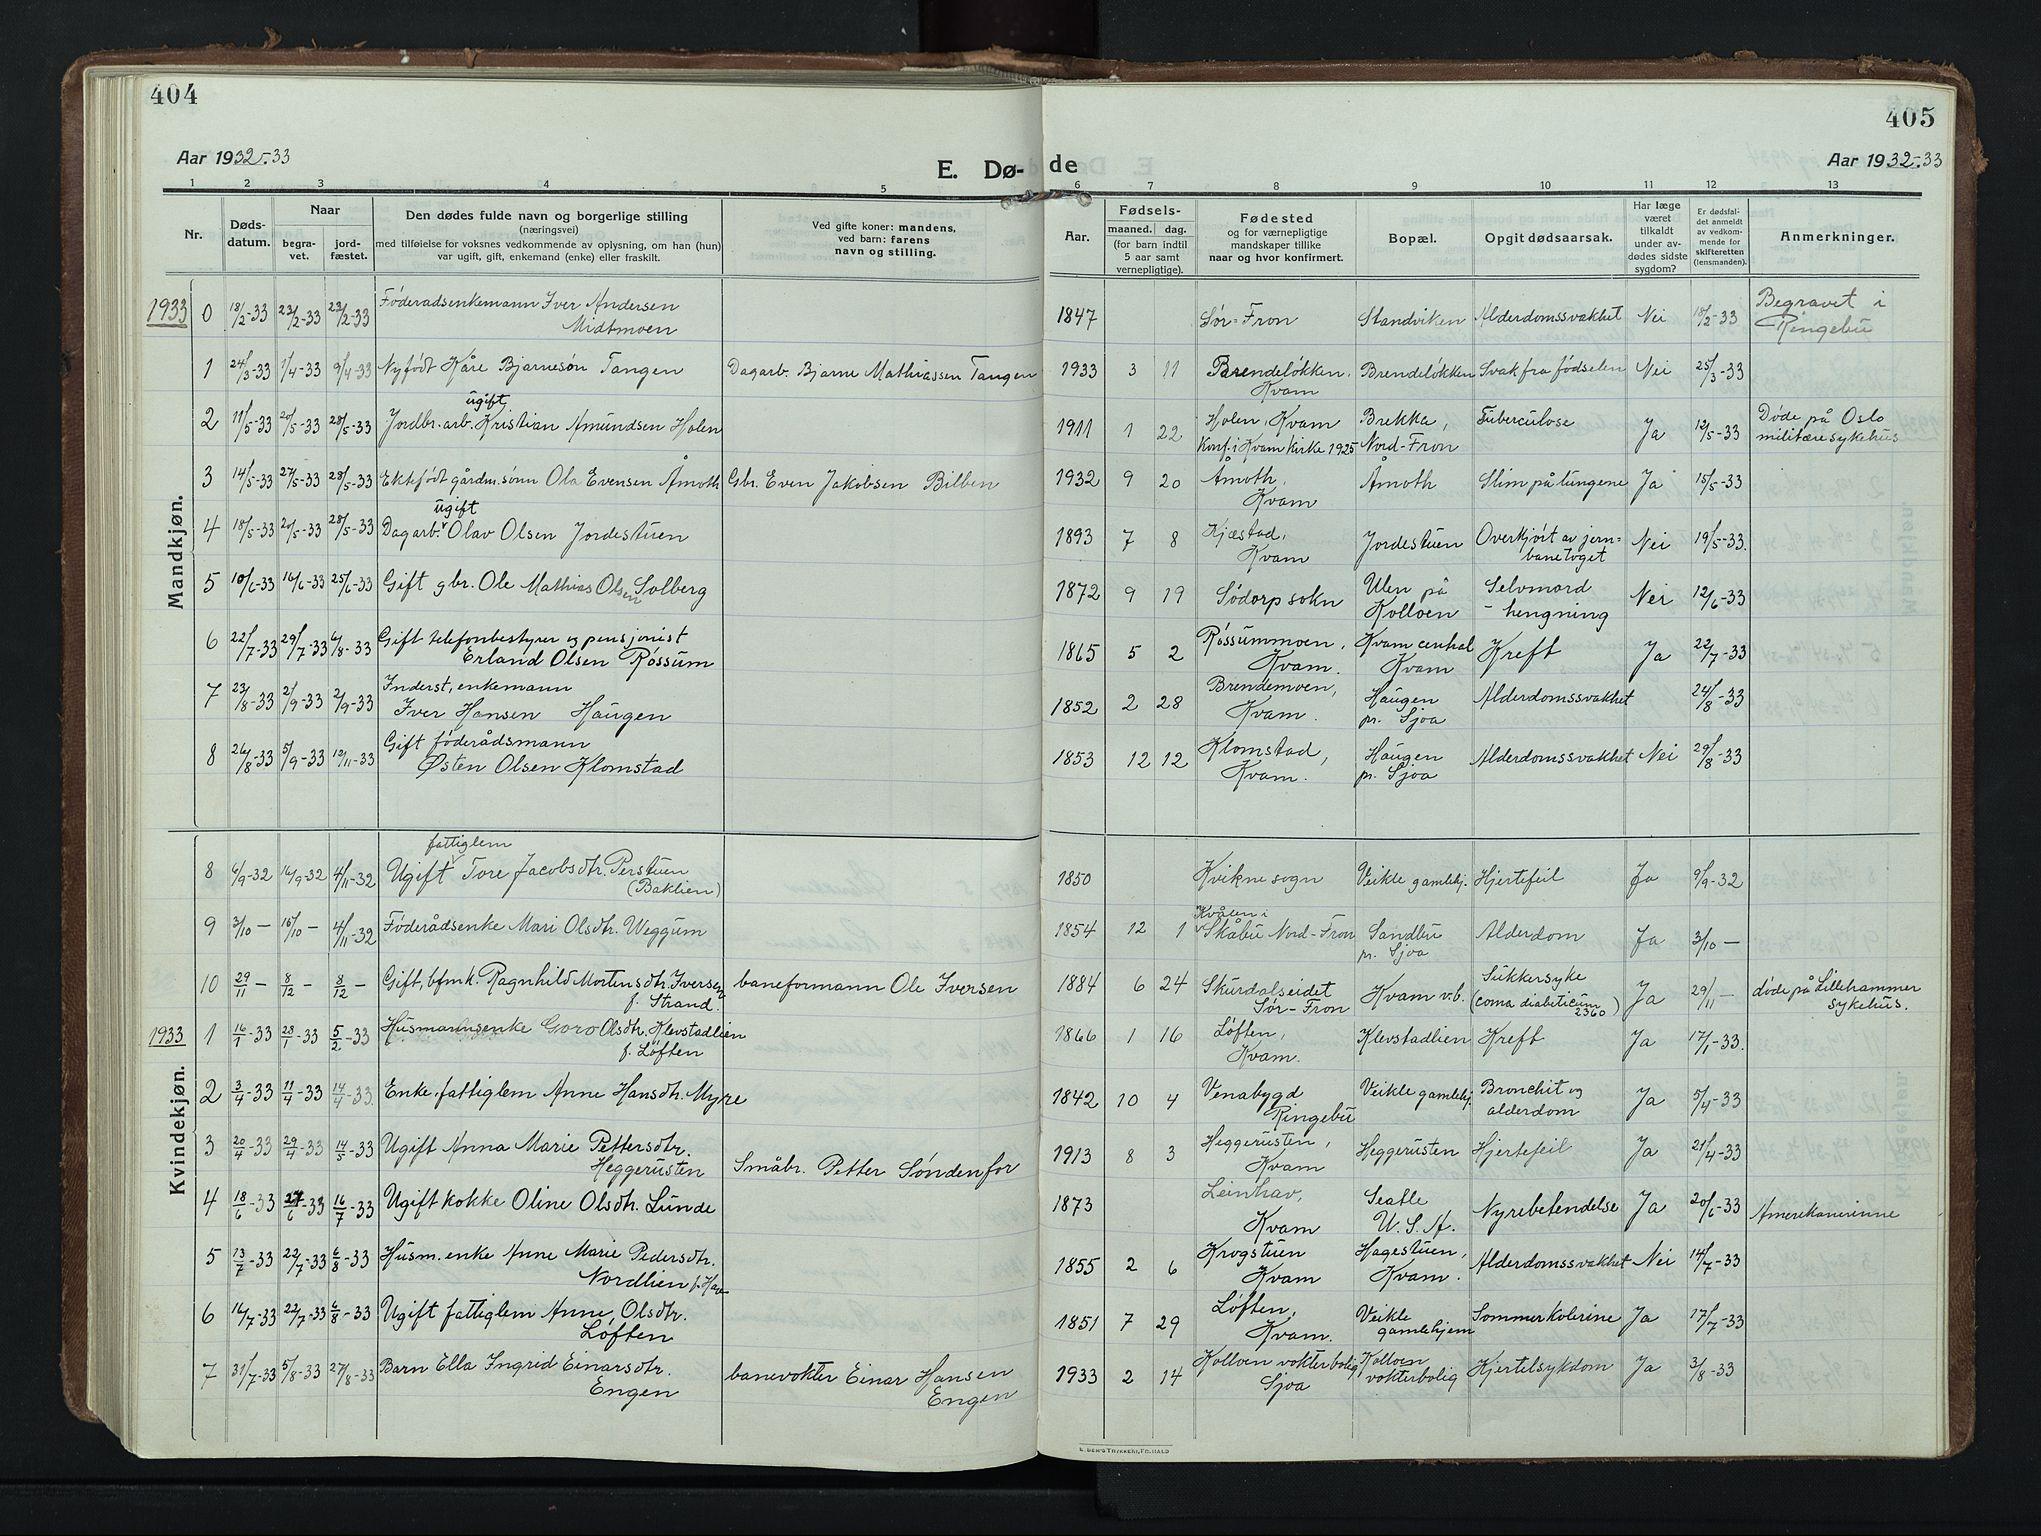 SAH, Nord-Fron prestekontor, Klokkerbok nr. 8, 1915-1948, s. 404-405